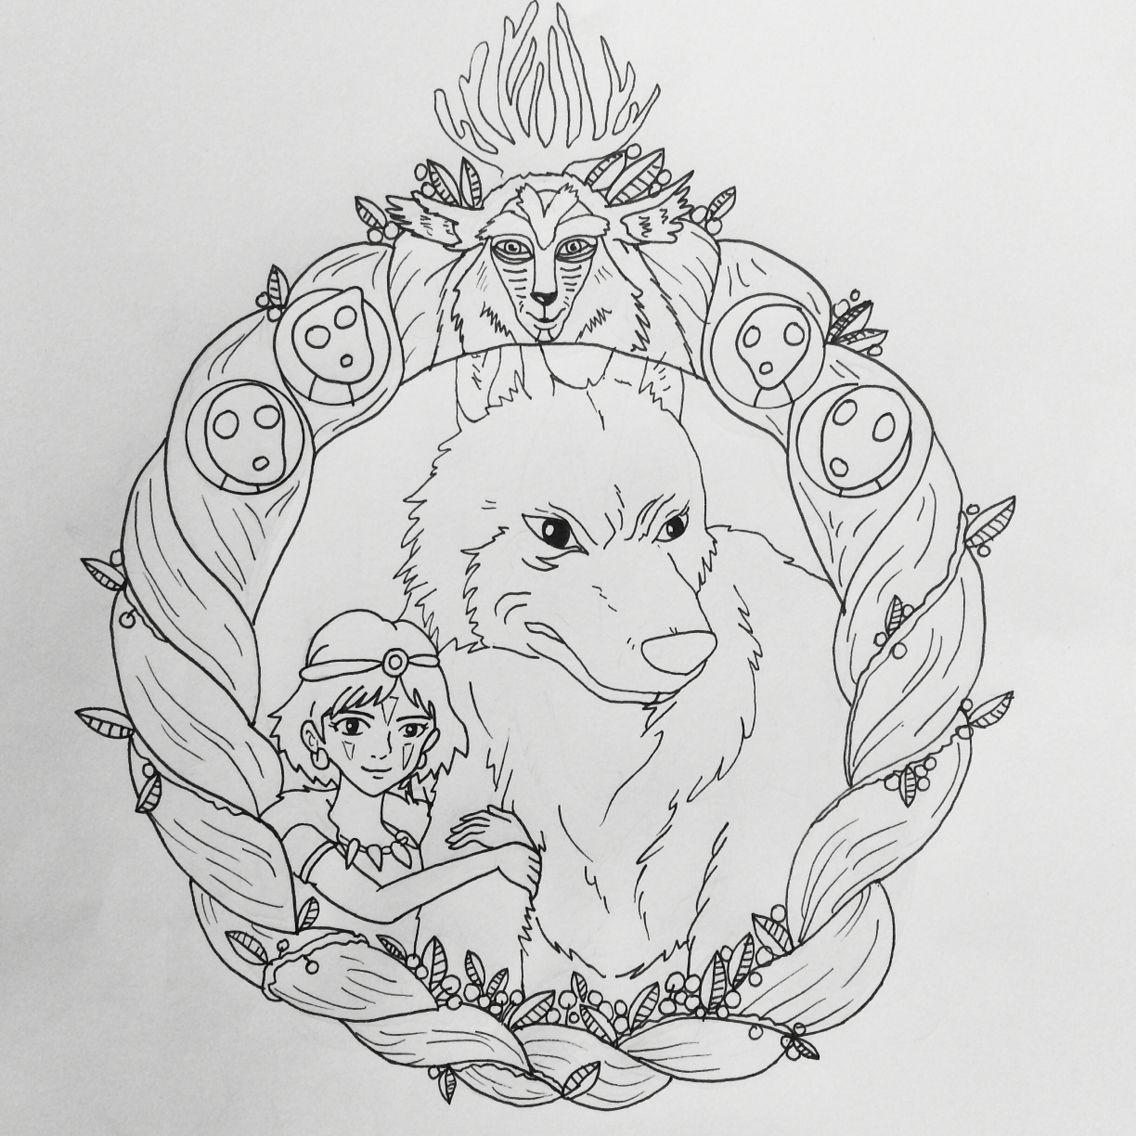 Princess Mononoke Tattoo Outline Ghibli Tattoo Princess Mononoke Tattoo Anime Tattoos